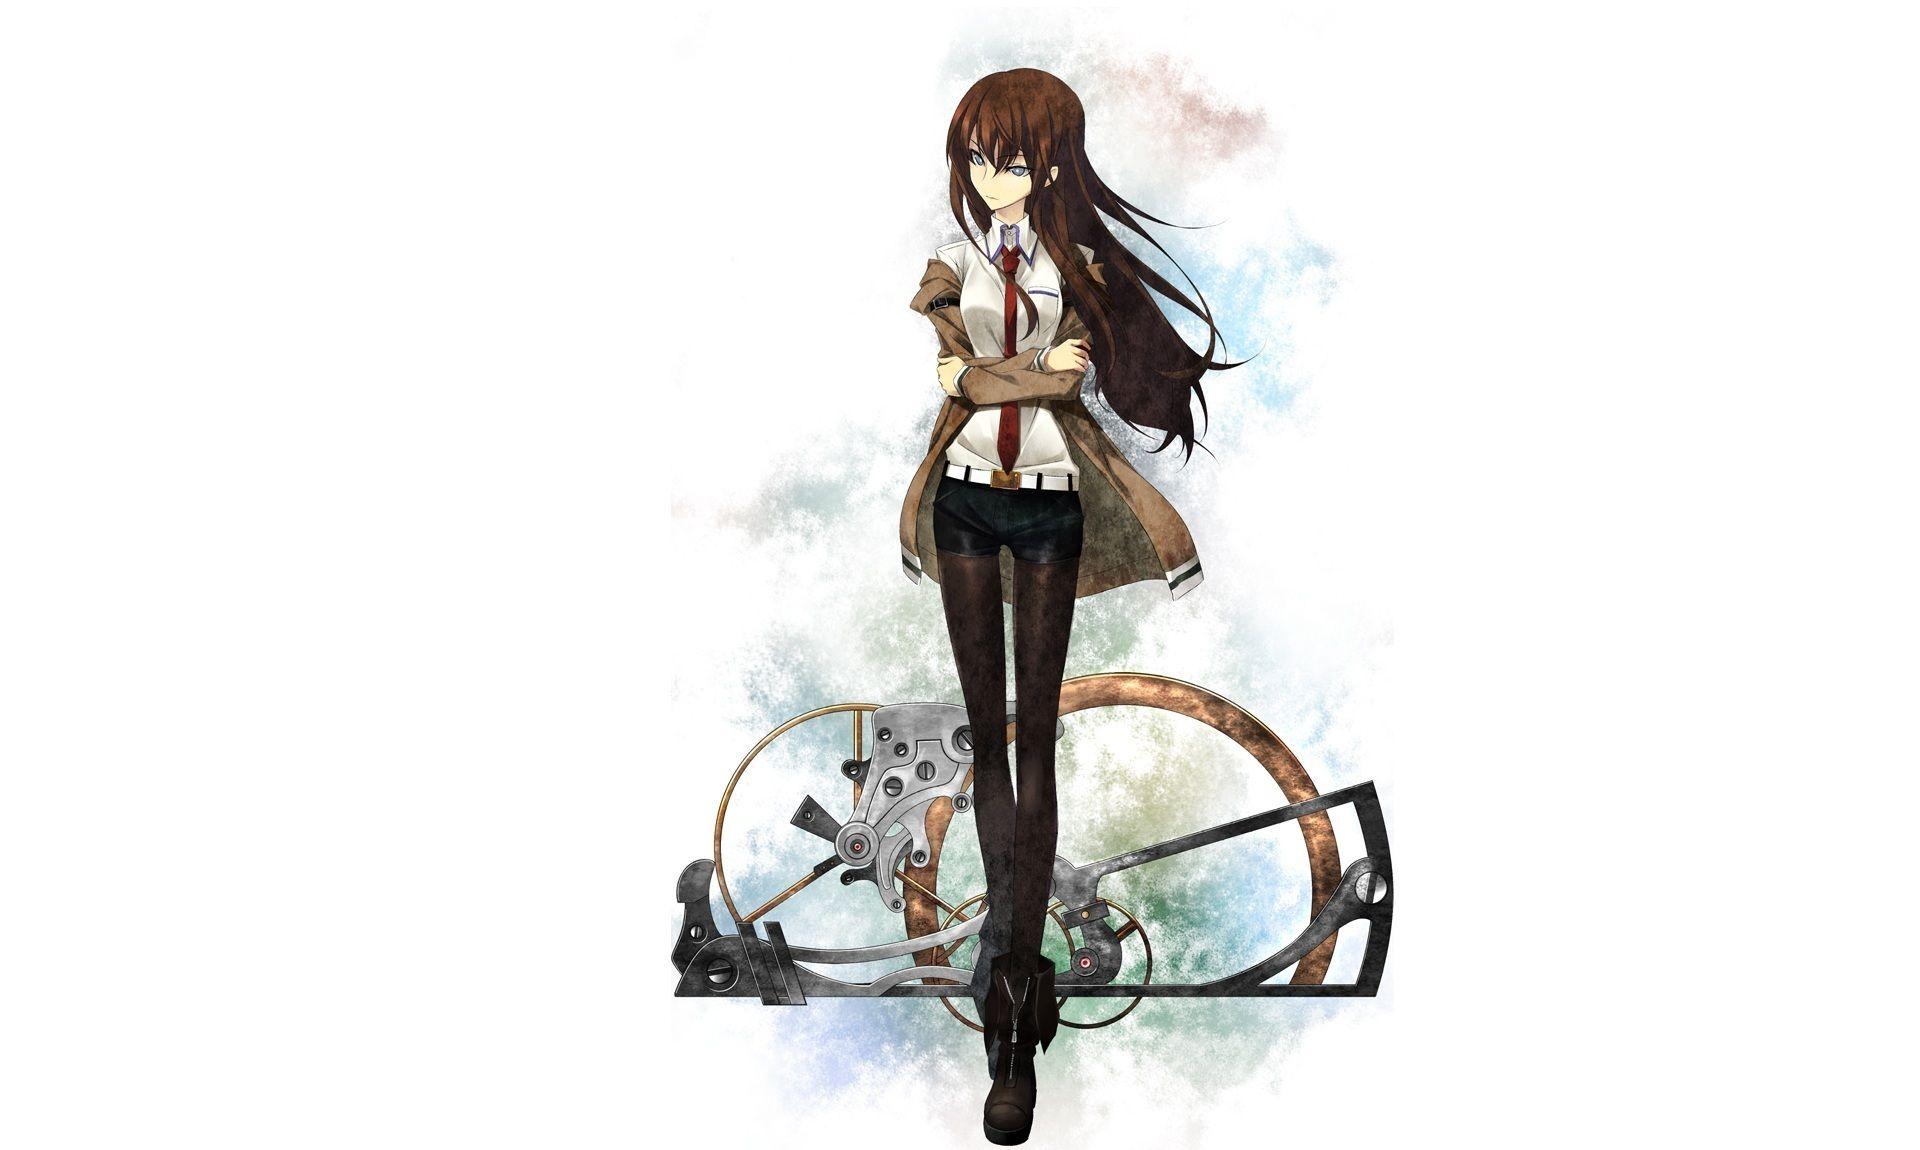 Makise Kurisu Part 6 1ecgef 100 イラスト シュタゲ アートスタイル